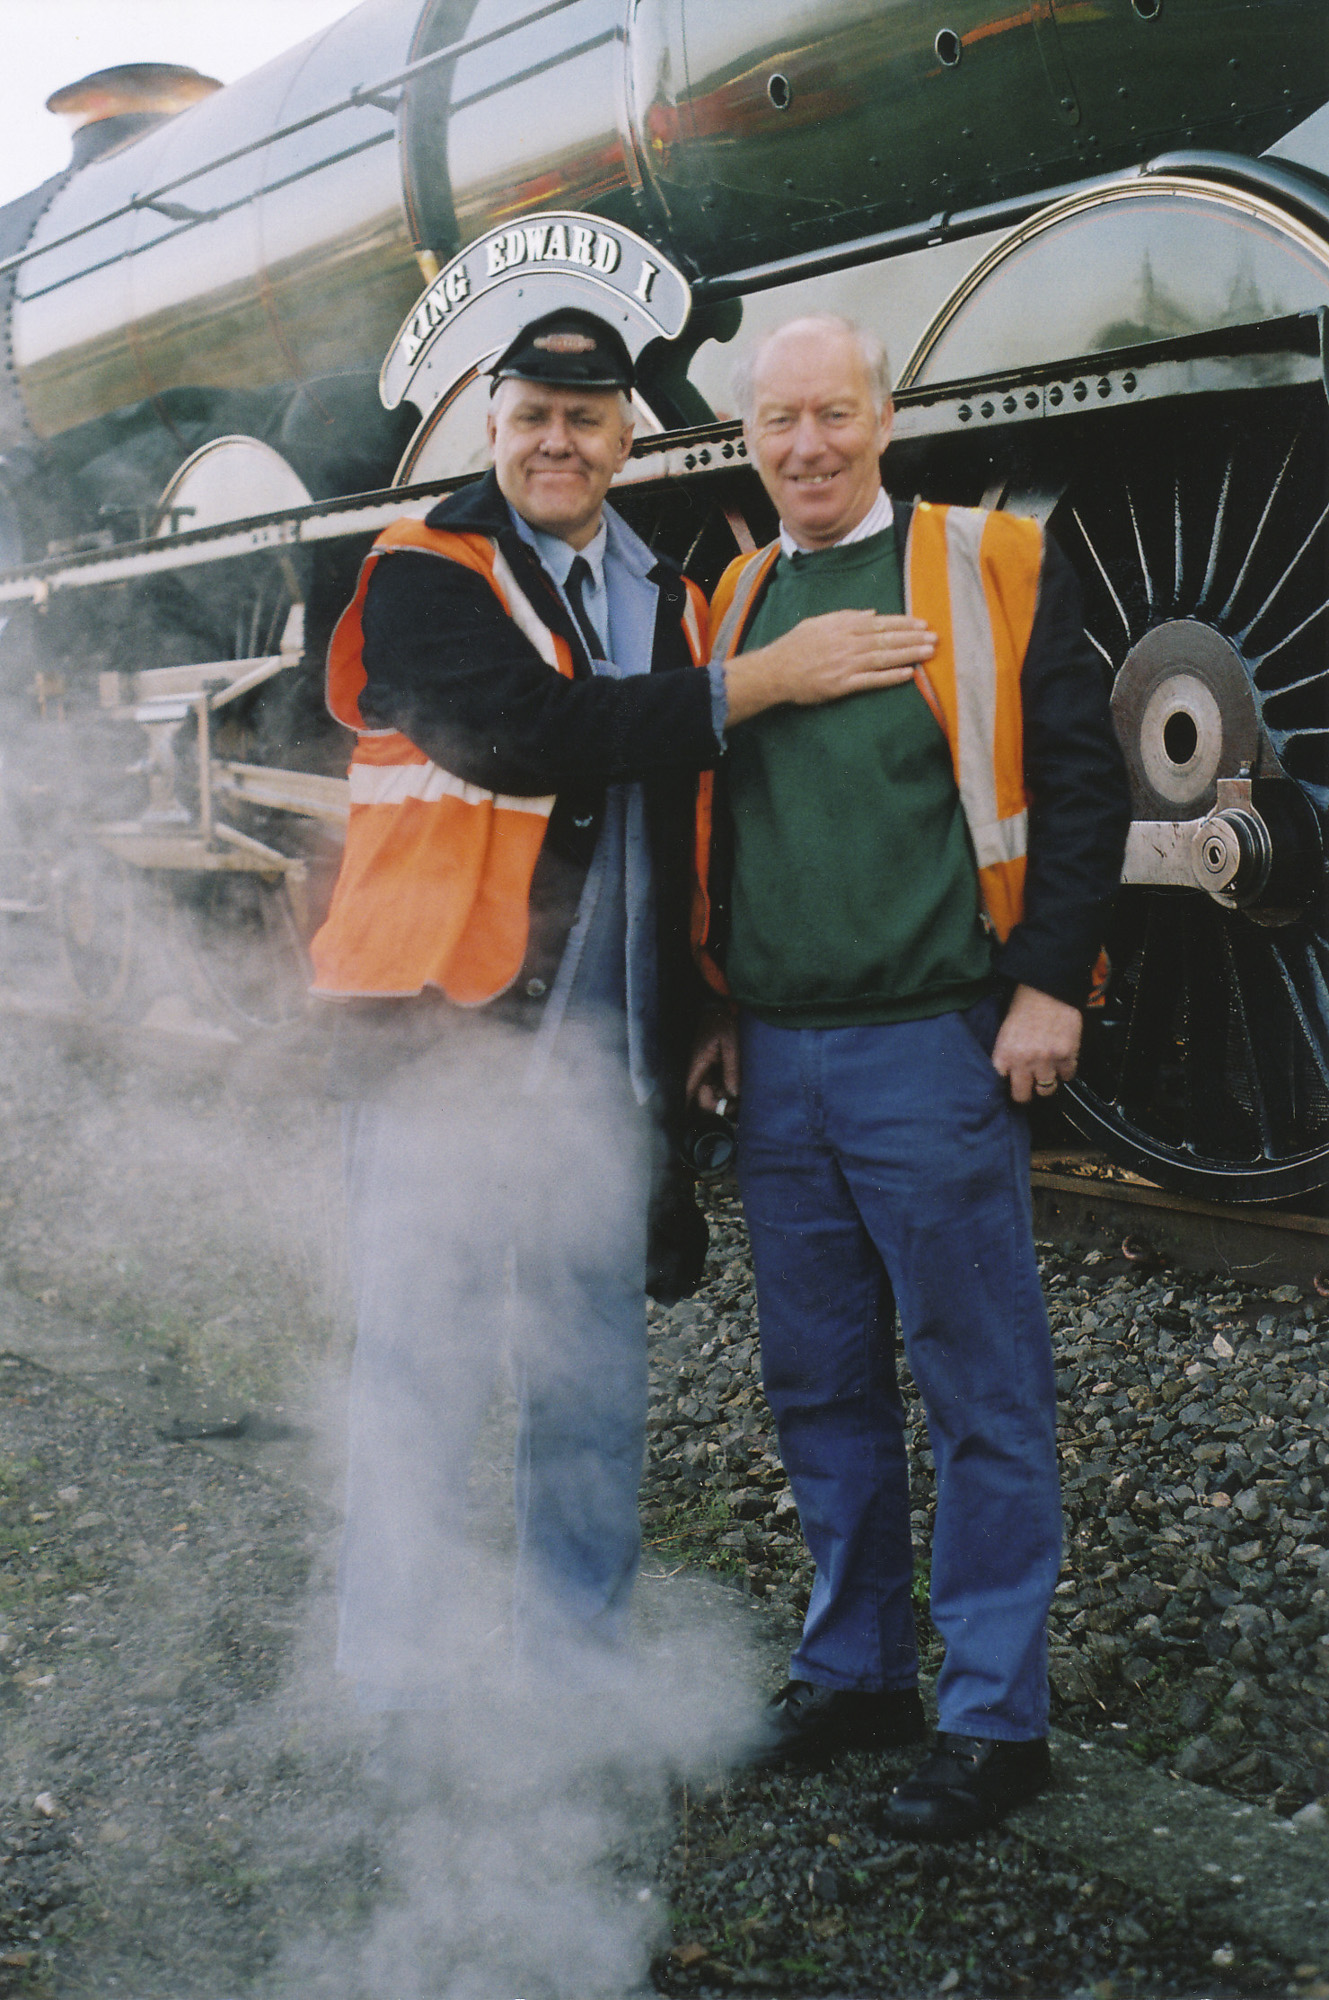 Paul Burns and Geoff Ewans. © Bob Robson/6024PS Ltd